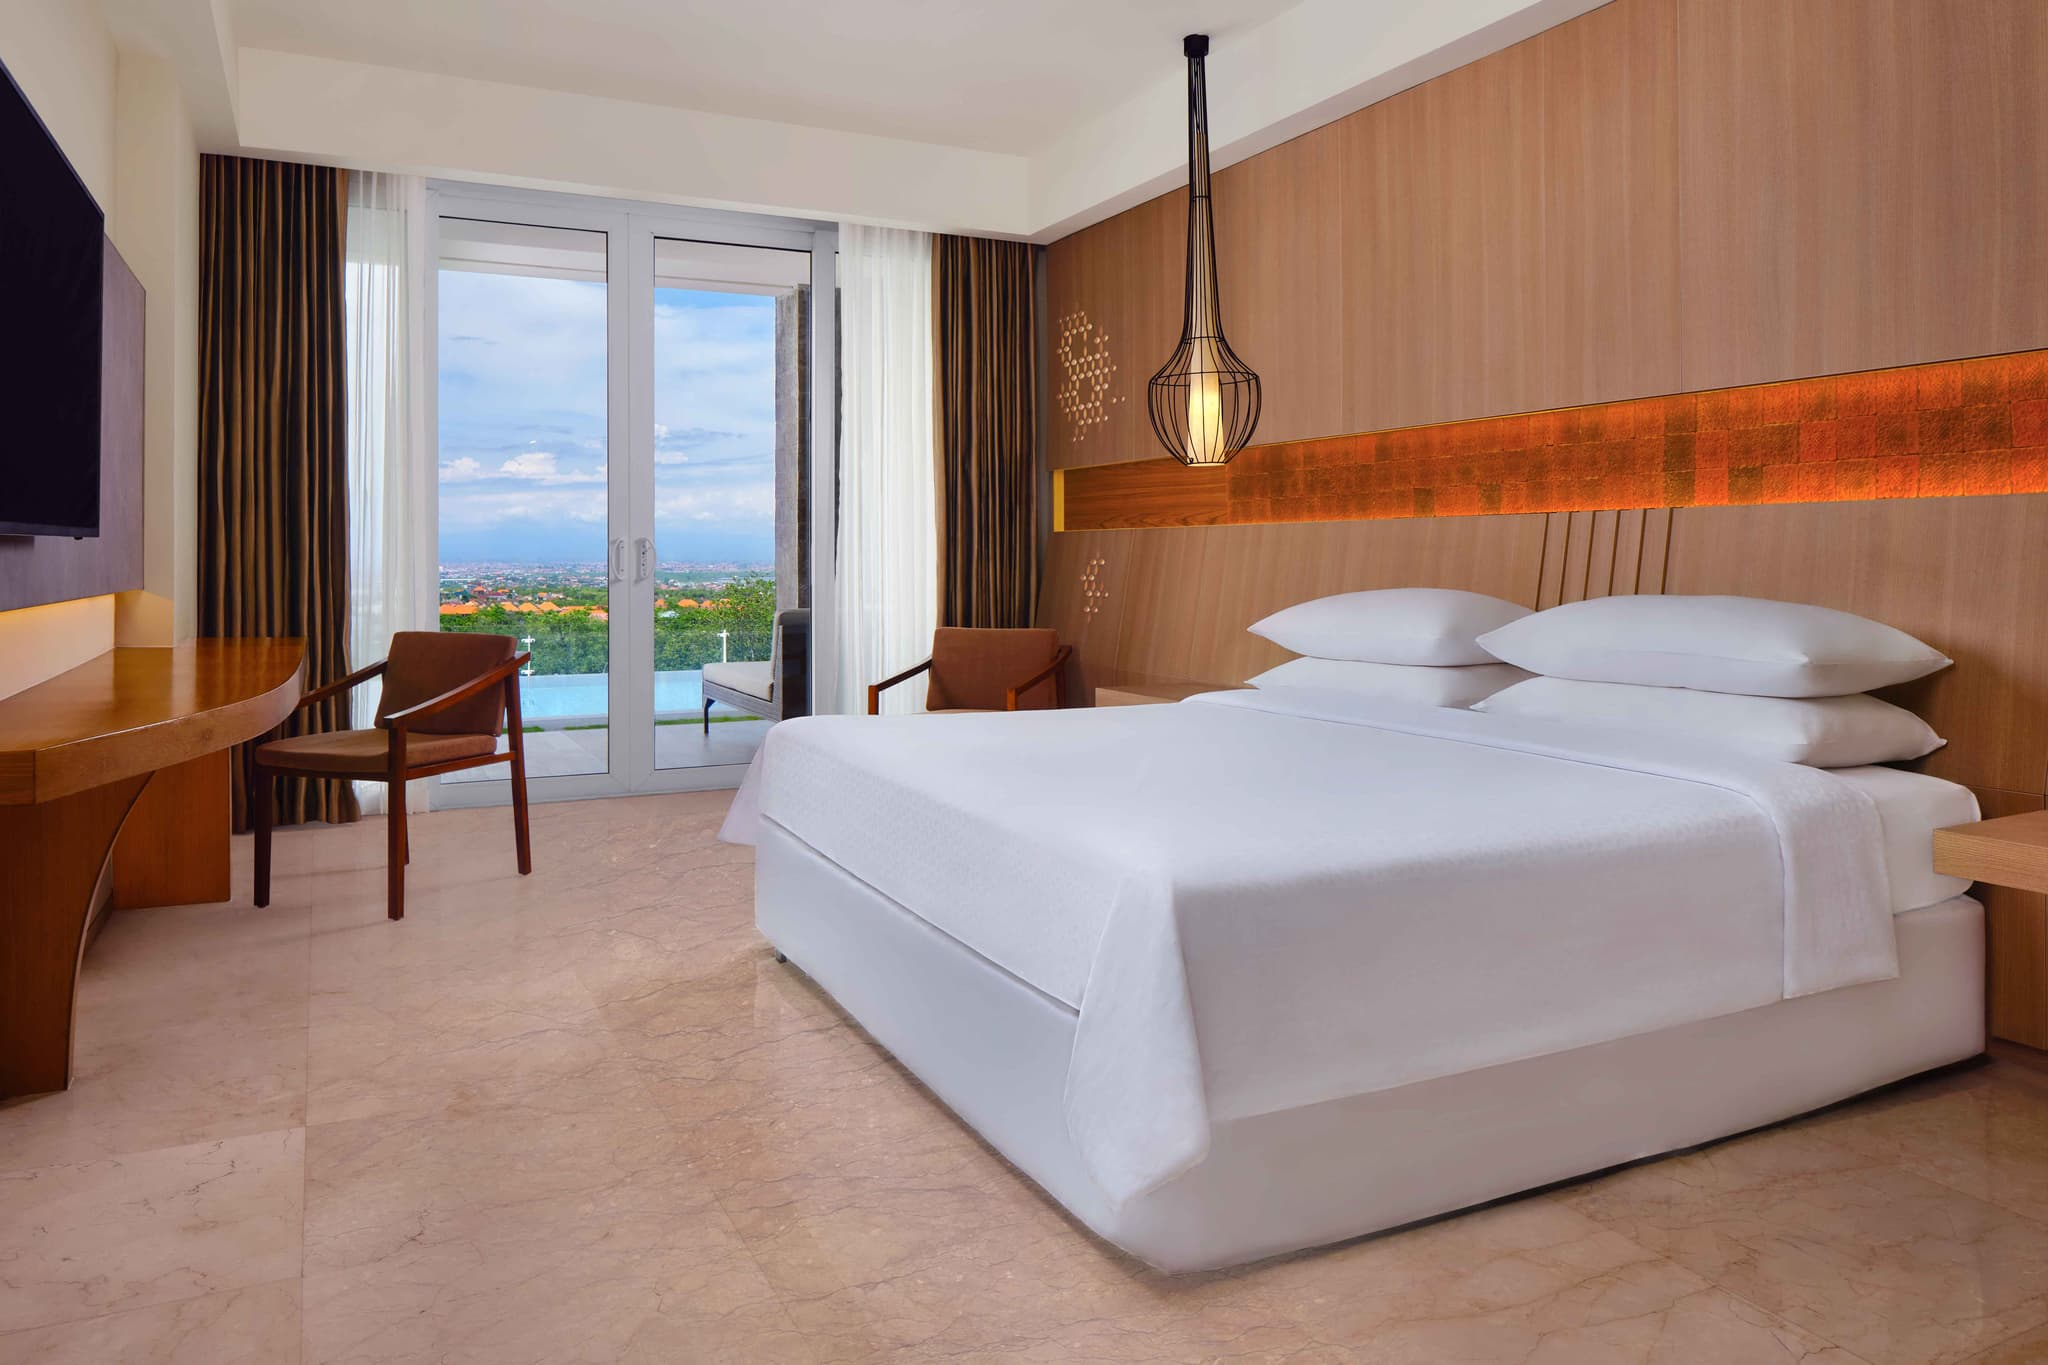 Room Voucher Four Points by Sheraton Bali, Ungasan - Di Indonesia Aja Voucher